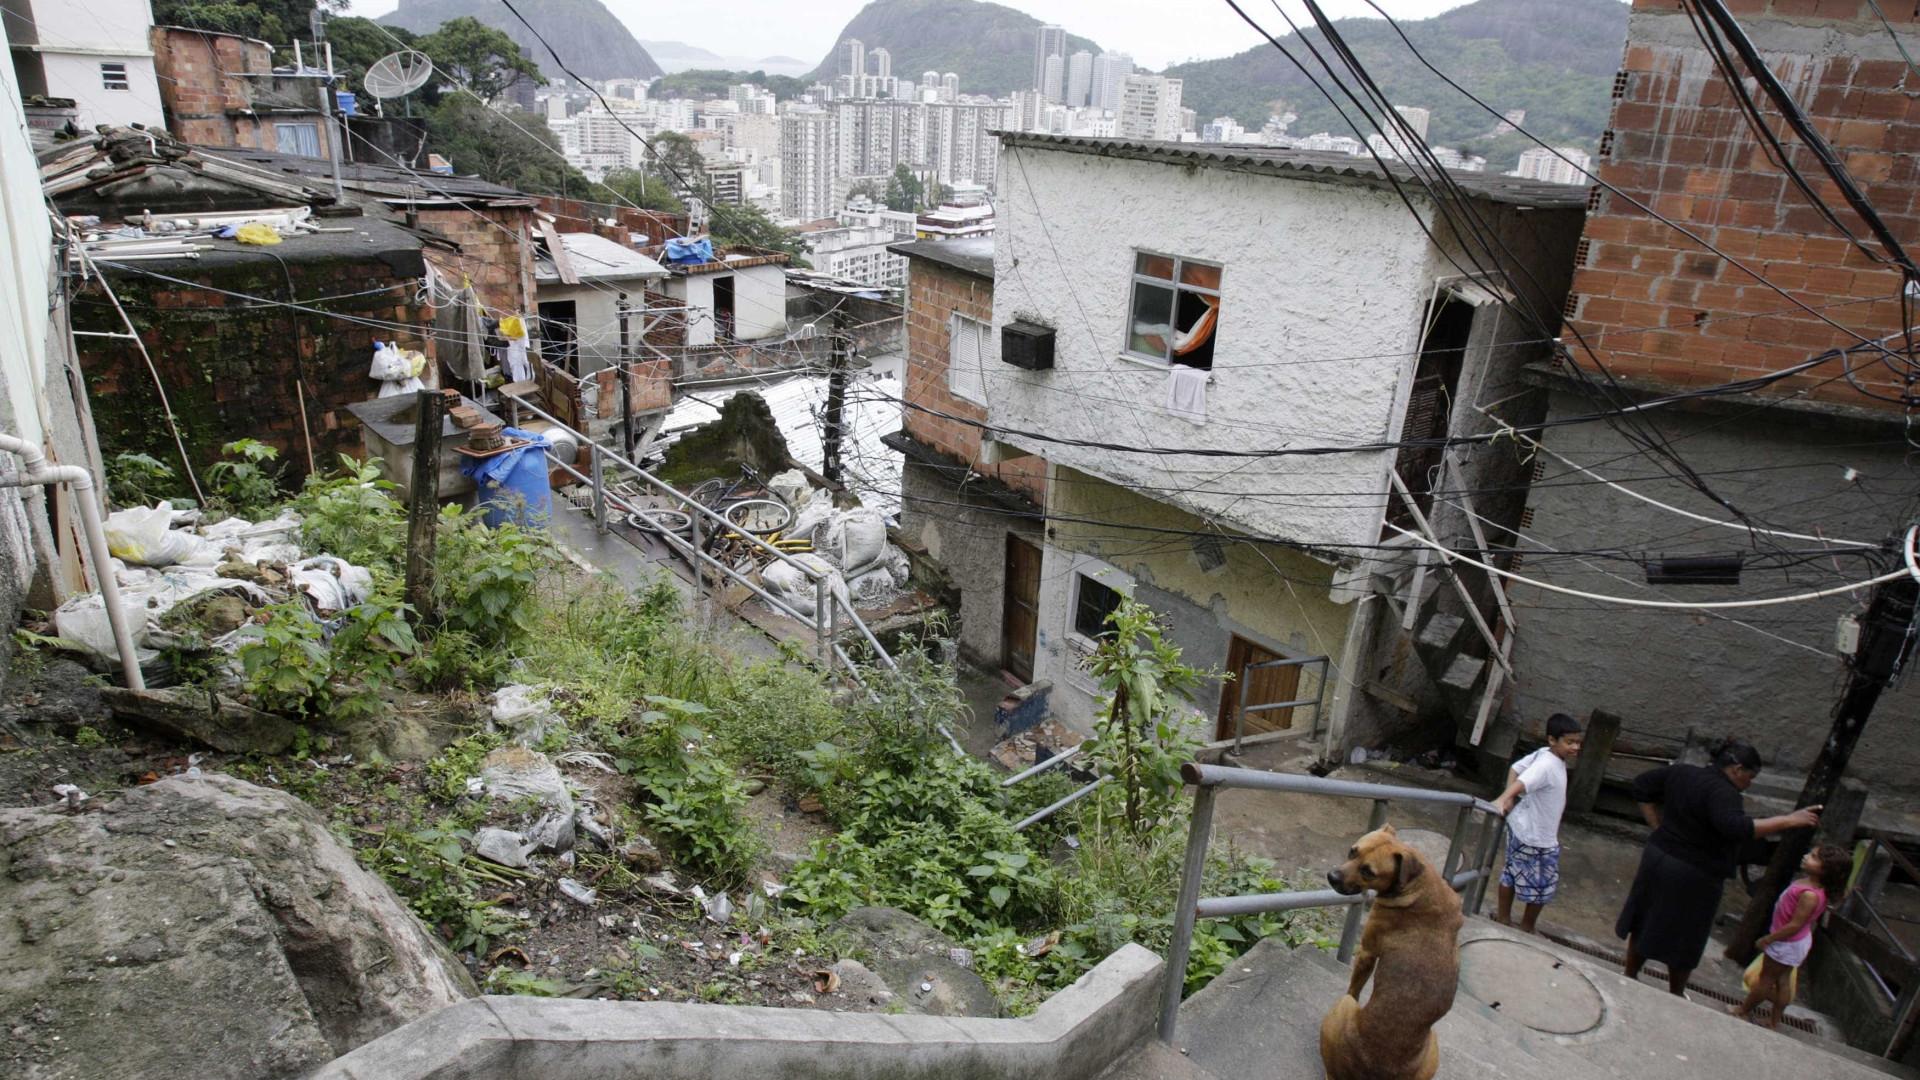 Mulher é vítima de bala perdida dentro de casa no Rio